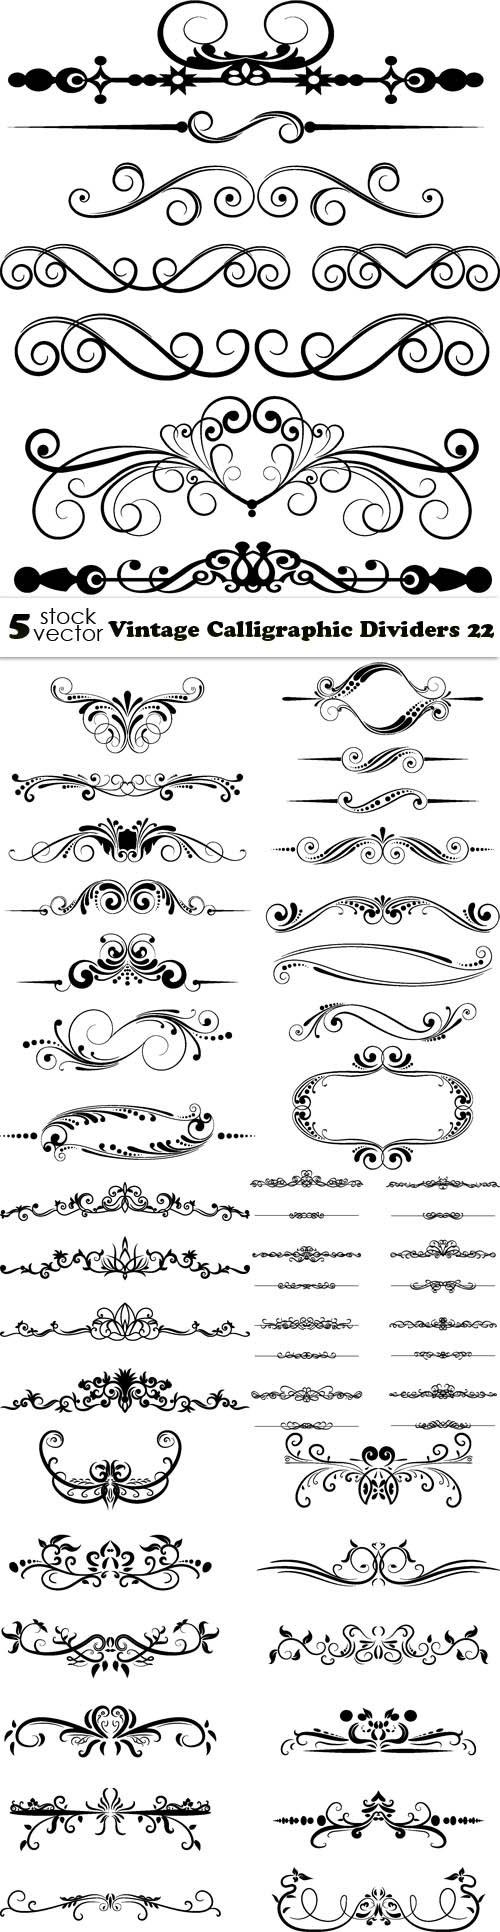 Vectors - Vintage Calligraphic Dividers 22